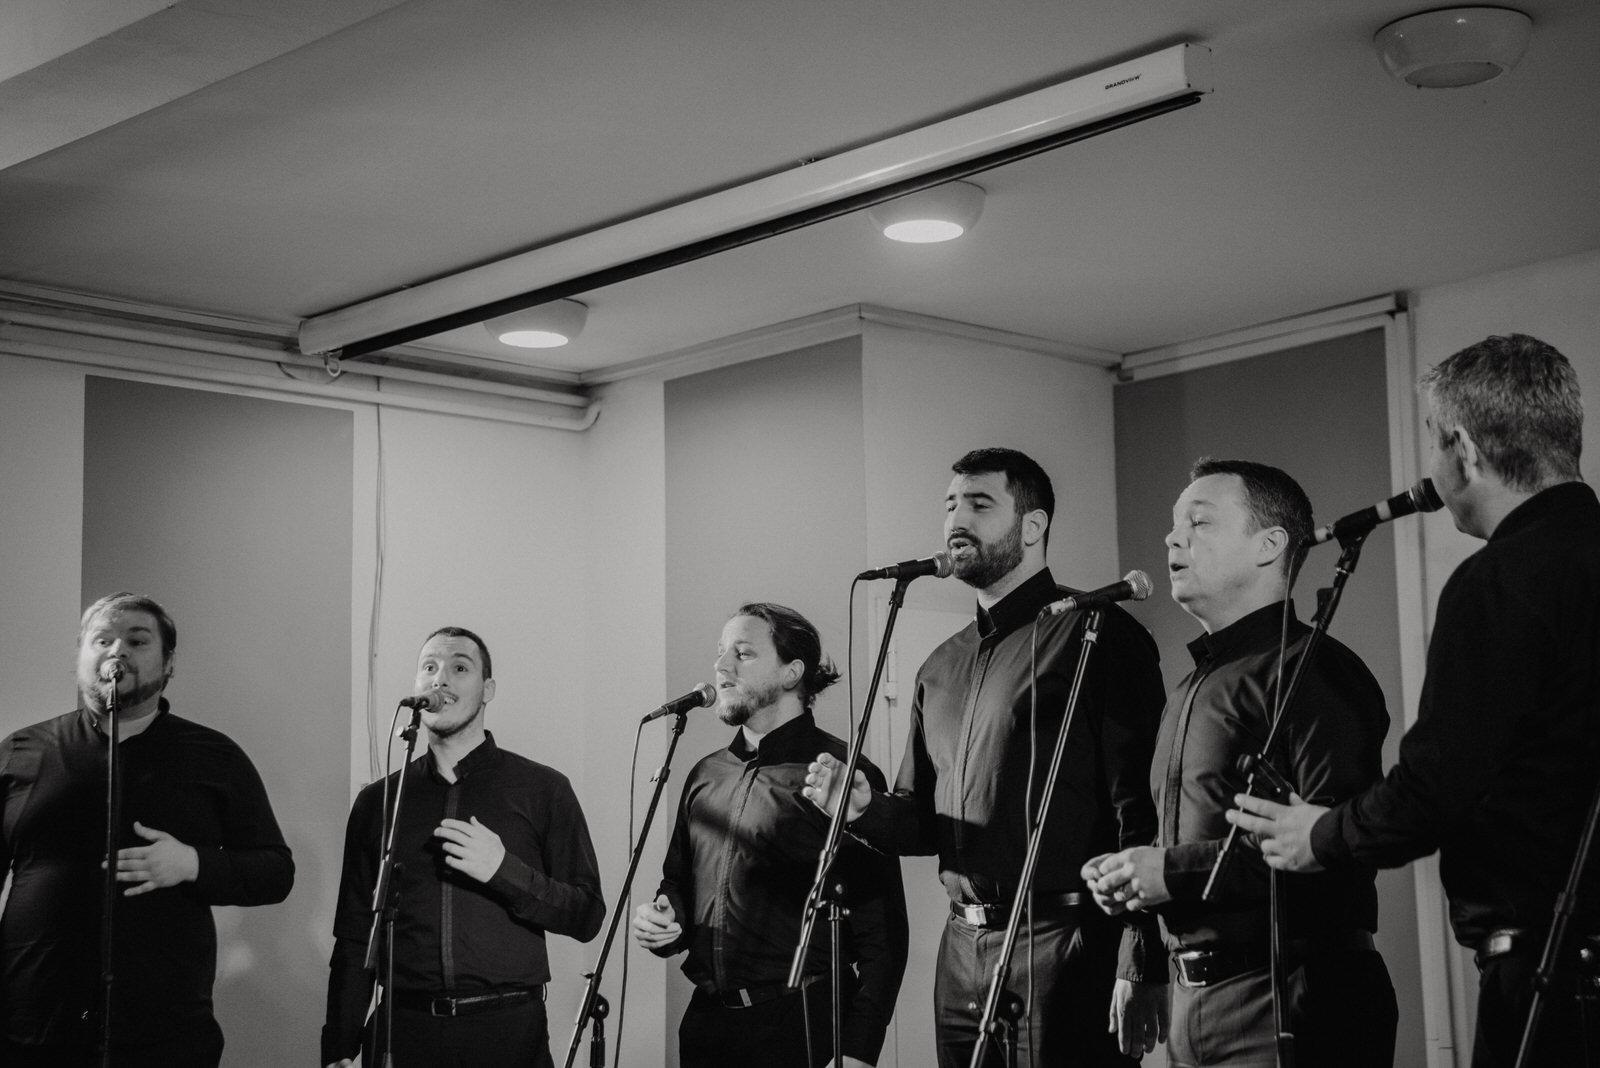 likaclub_koncert-klapa-cambi_kic-gospić_2019-8